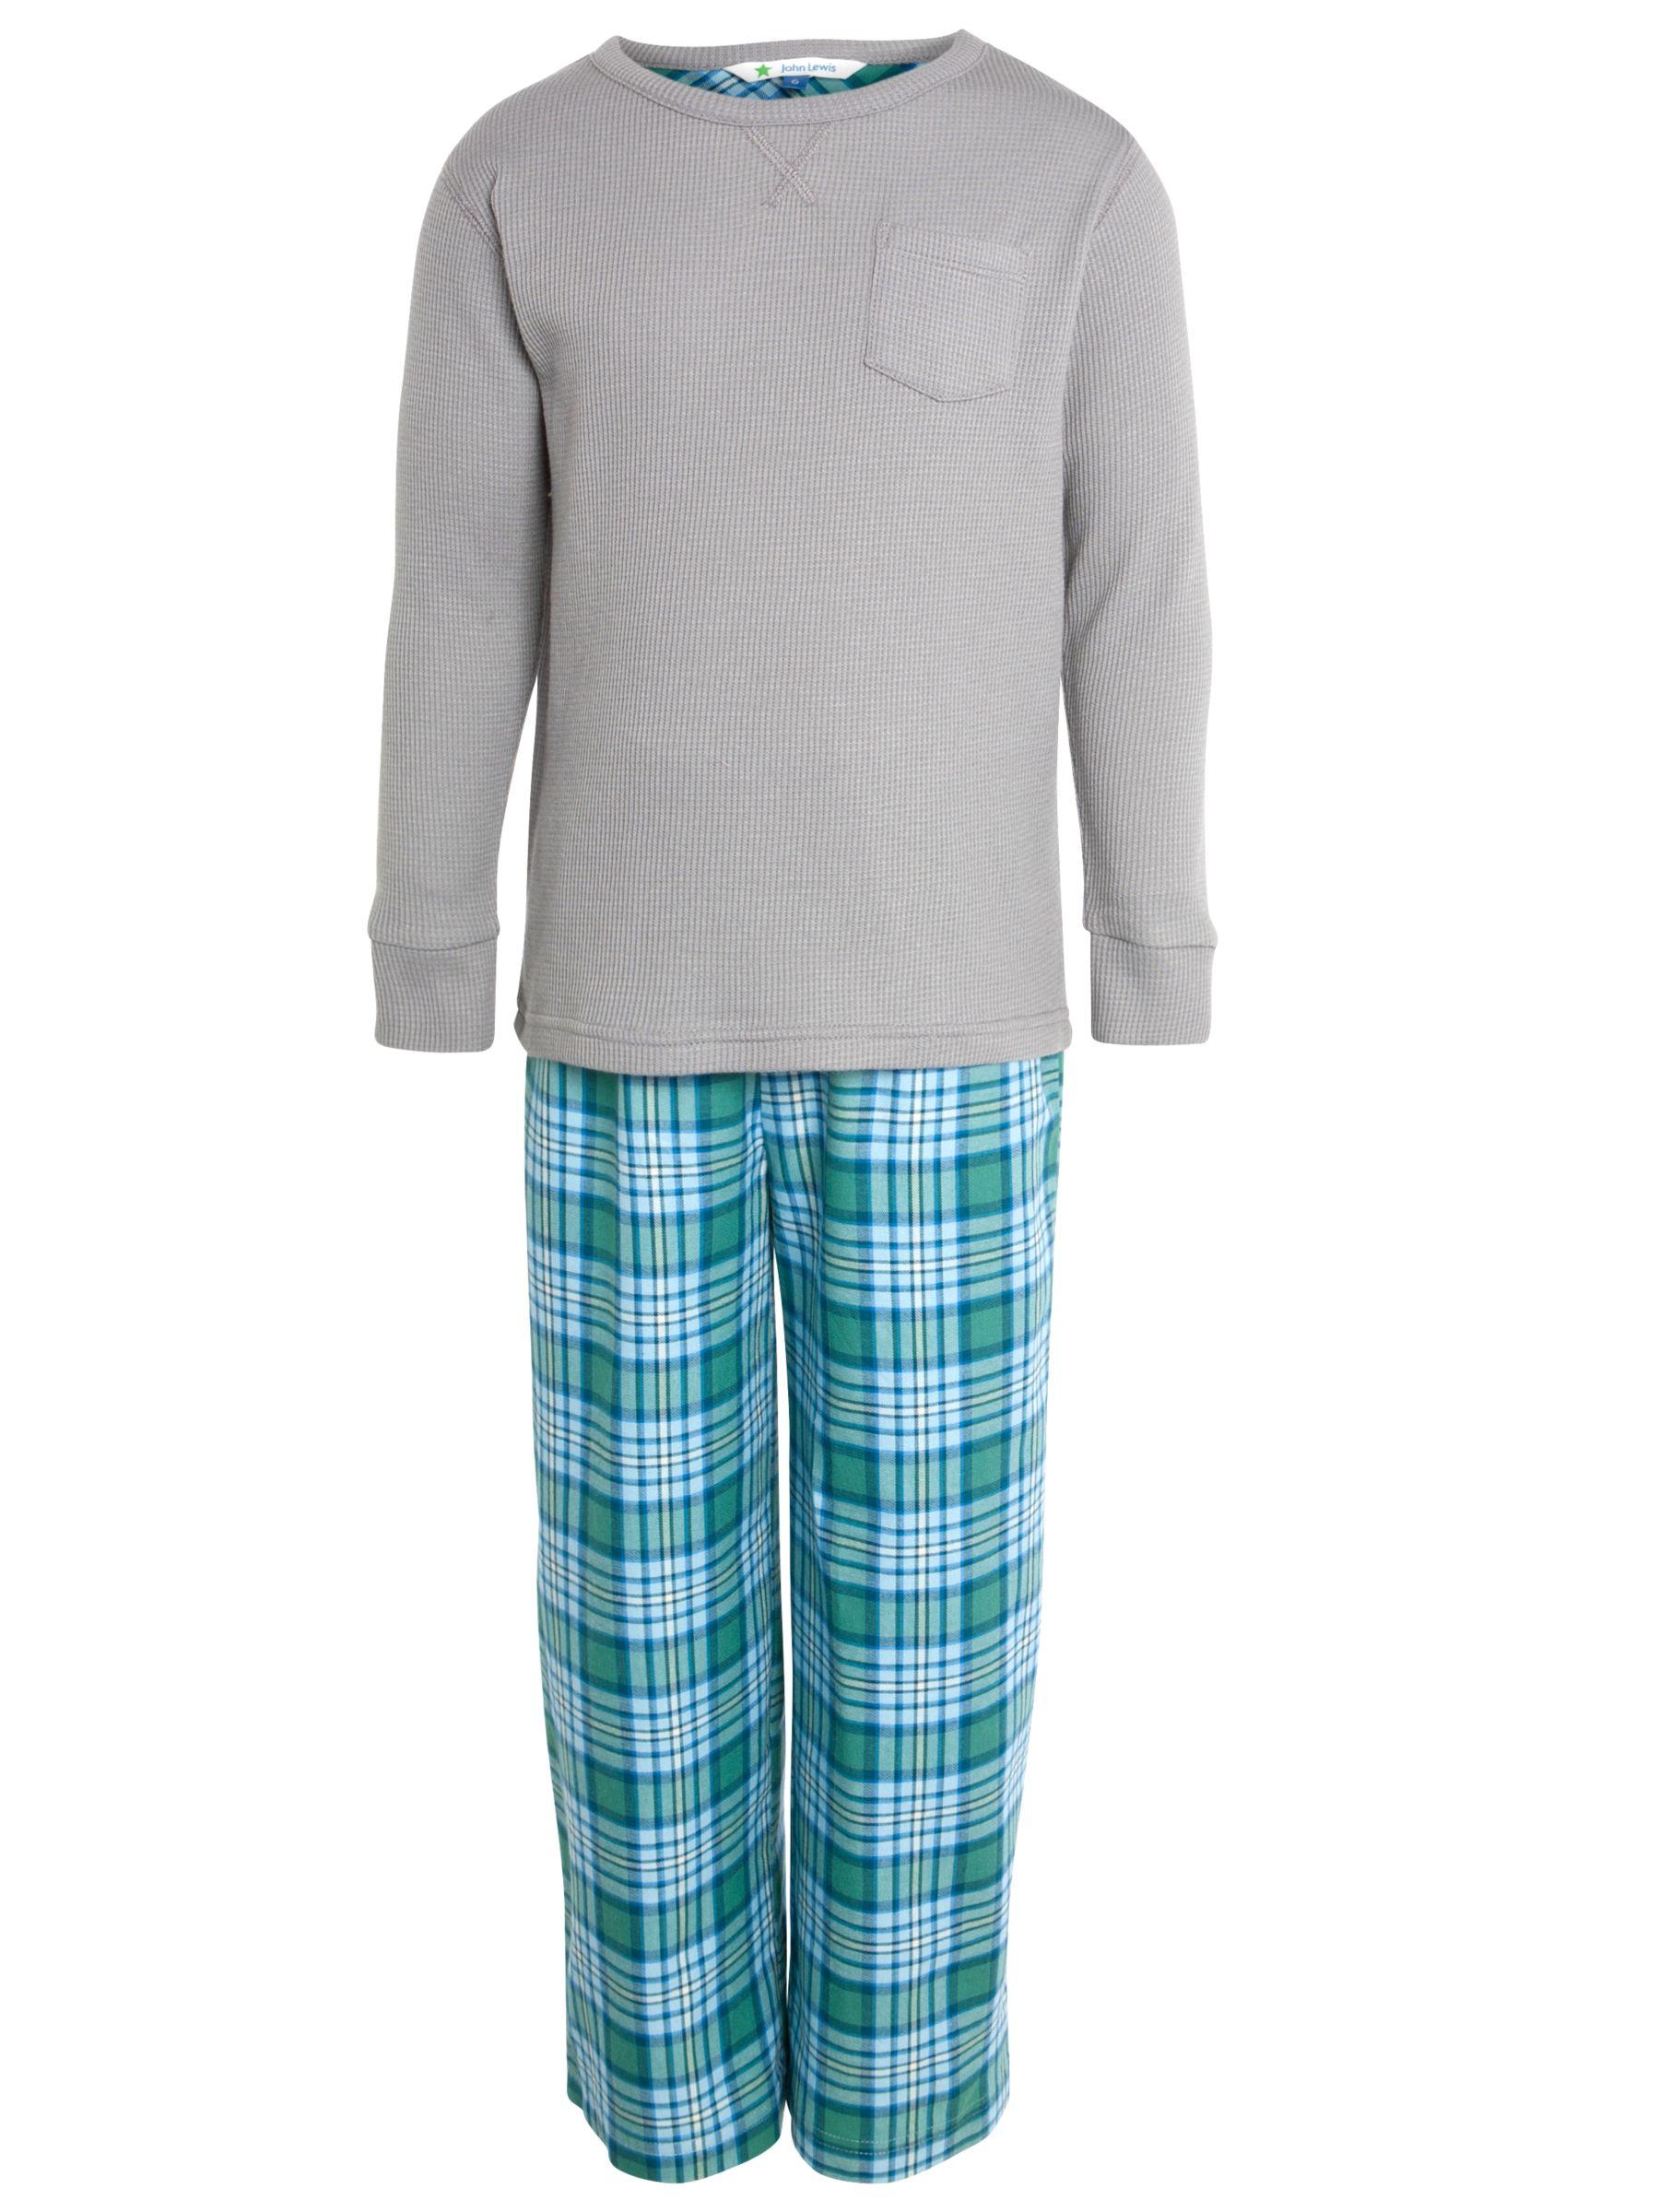 John Lewis Boy Waffle/Check Pyjamas, Grey/Green